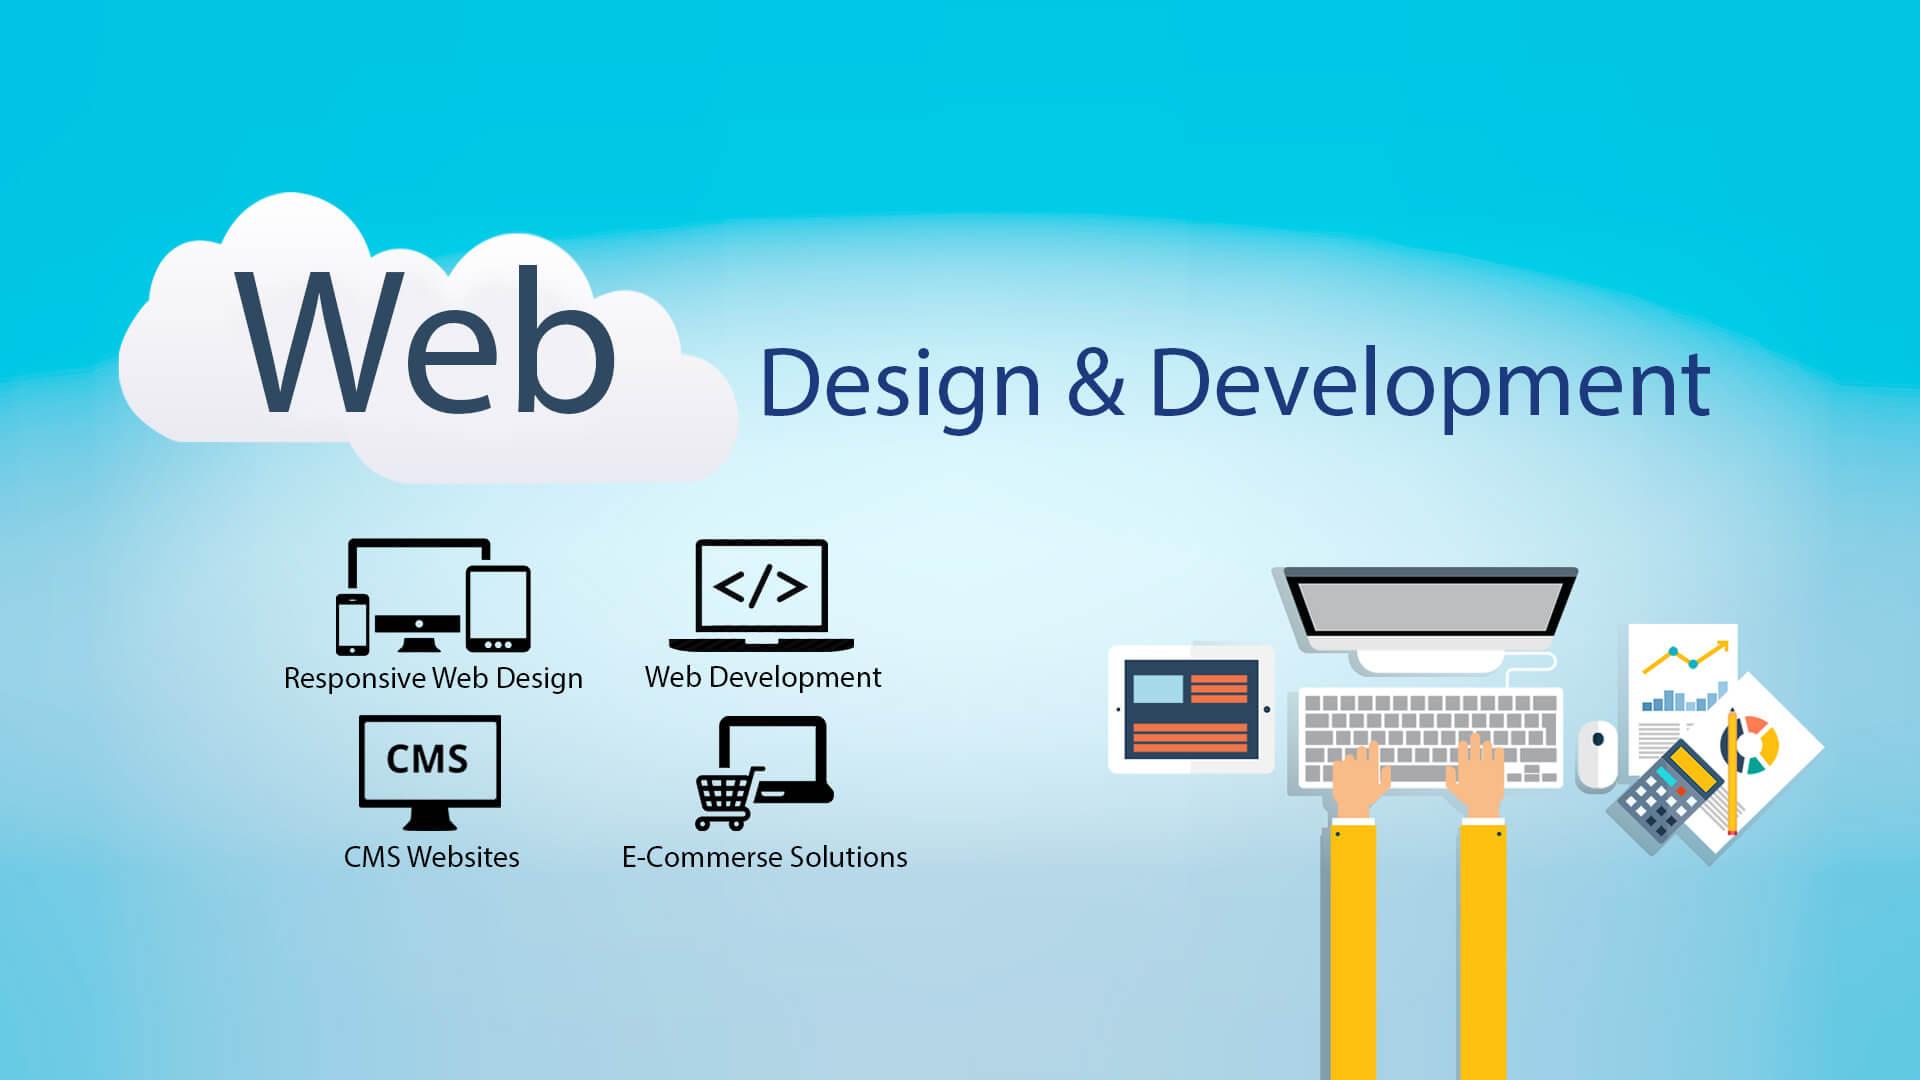 Responsive Web Design & WordPress Web Development is the Core